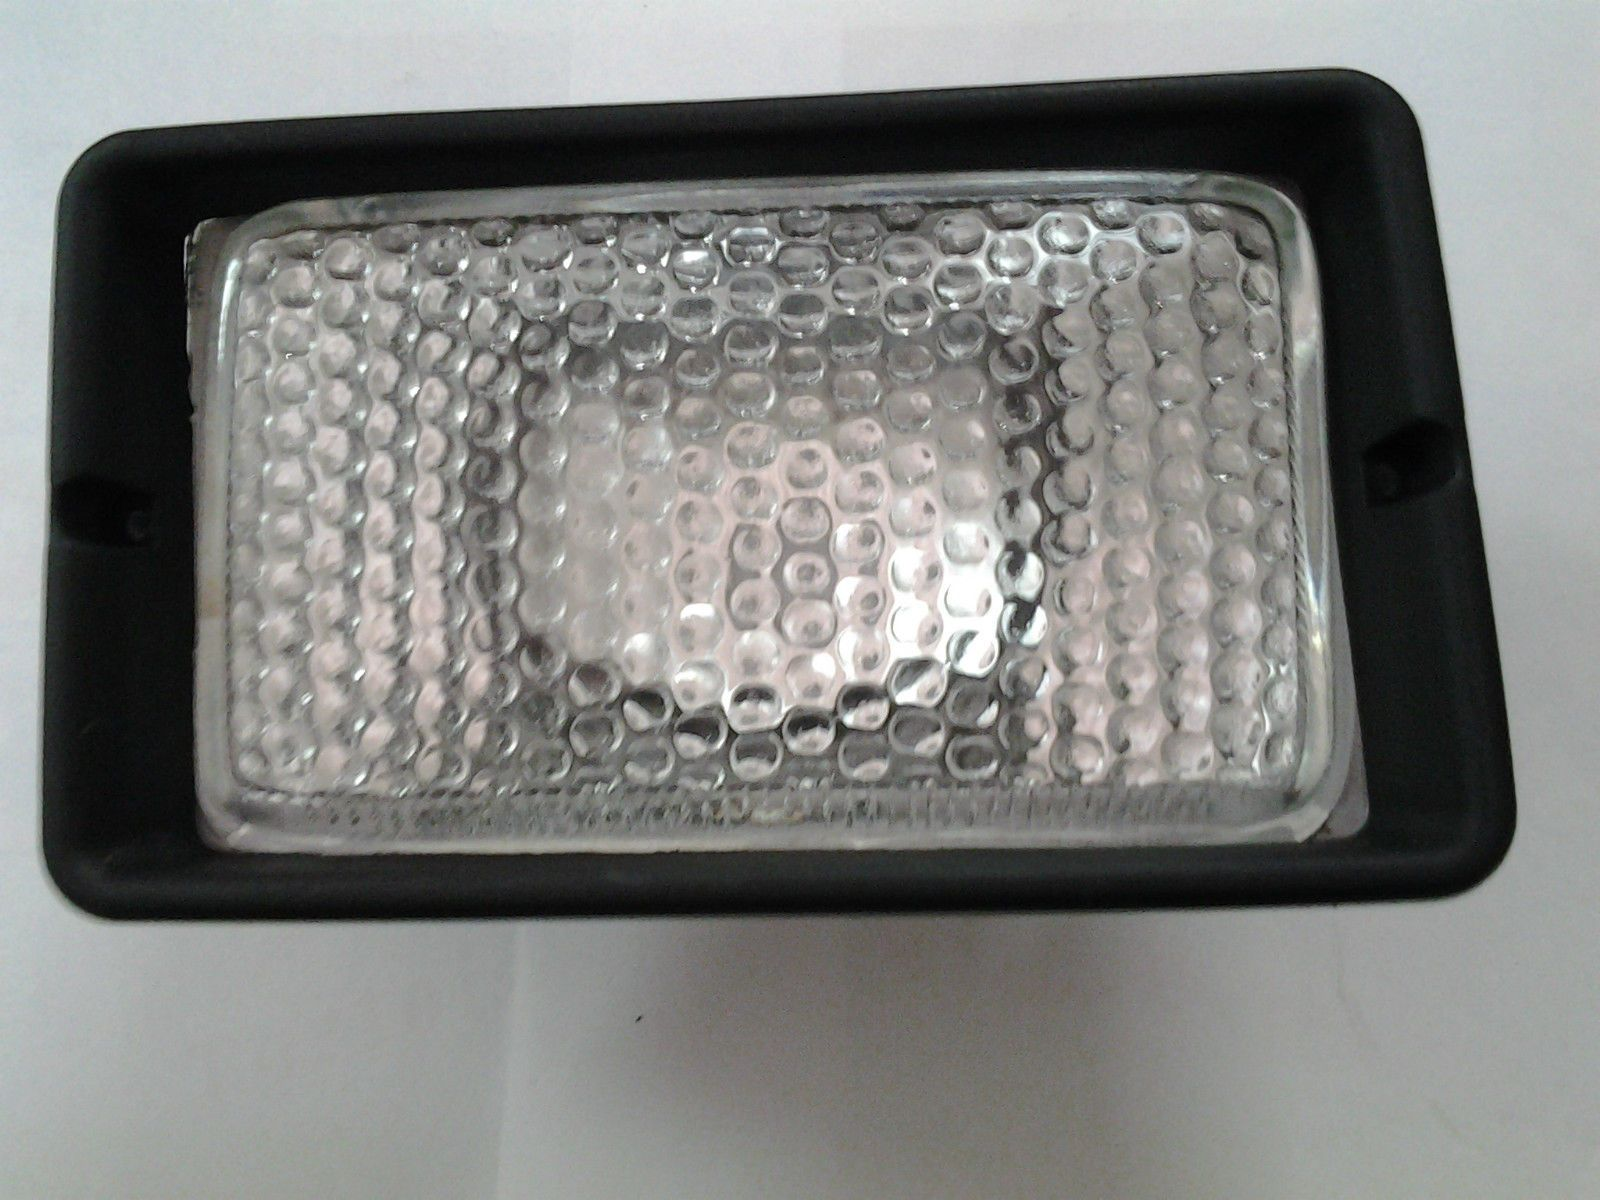 2X JCB 3DX Cabin Lamp Ace Terex Tata L T with Bulbs eBay